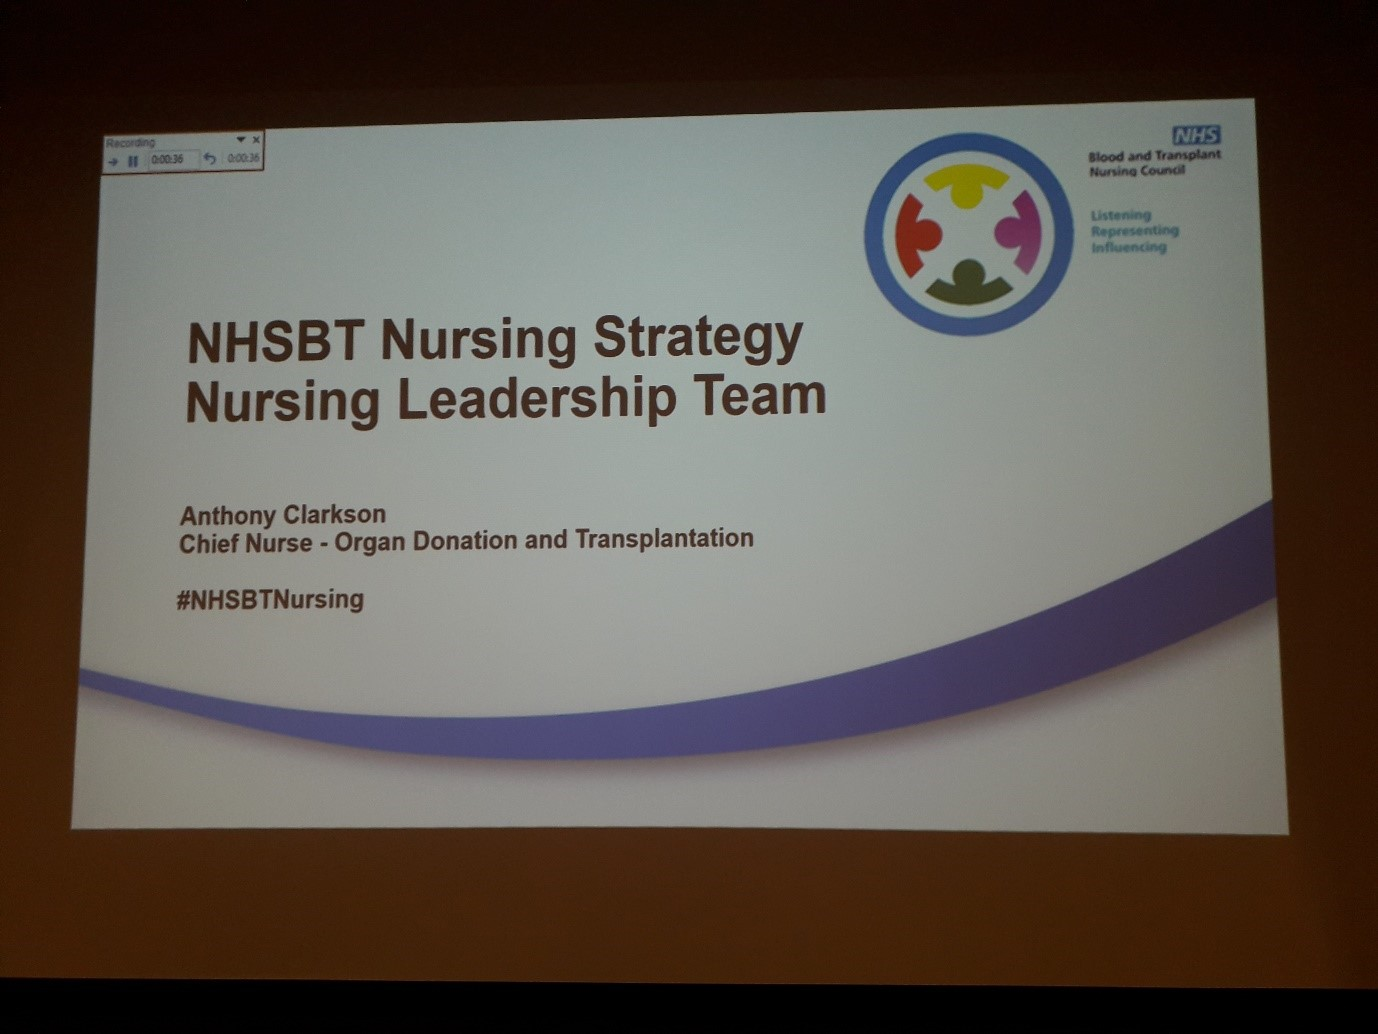 Nursing strategy PowerPoint slide